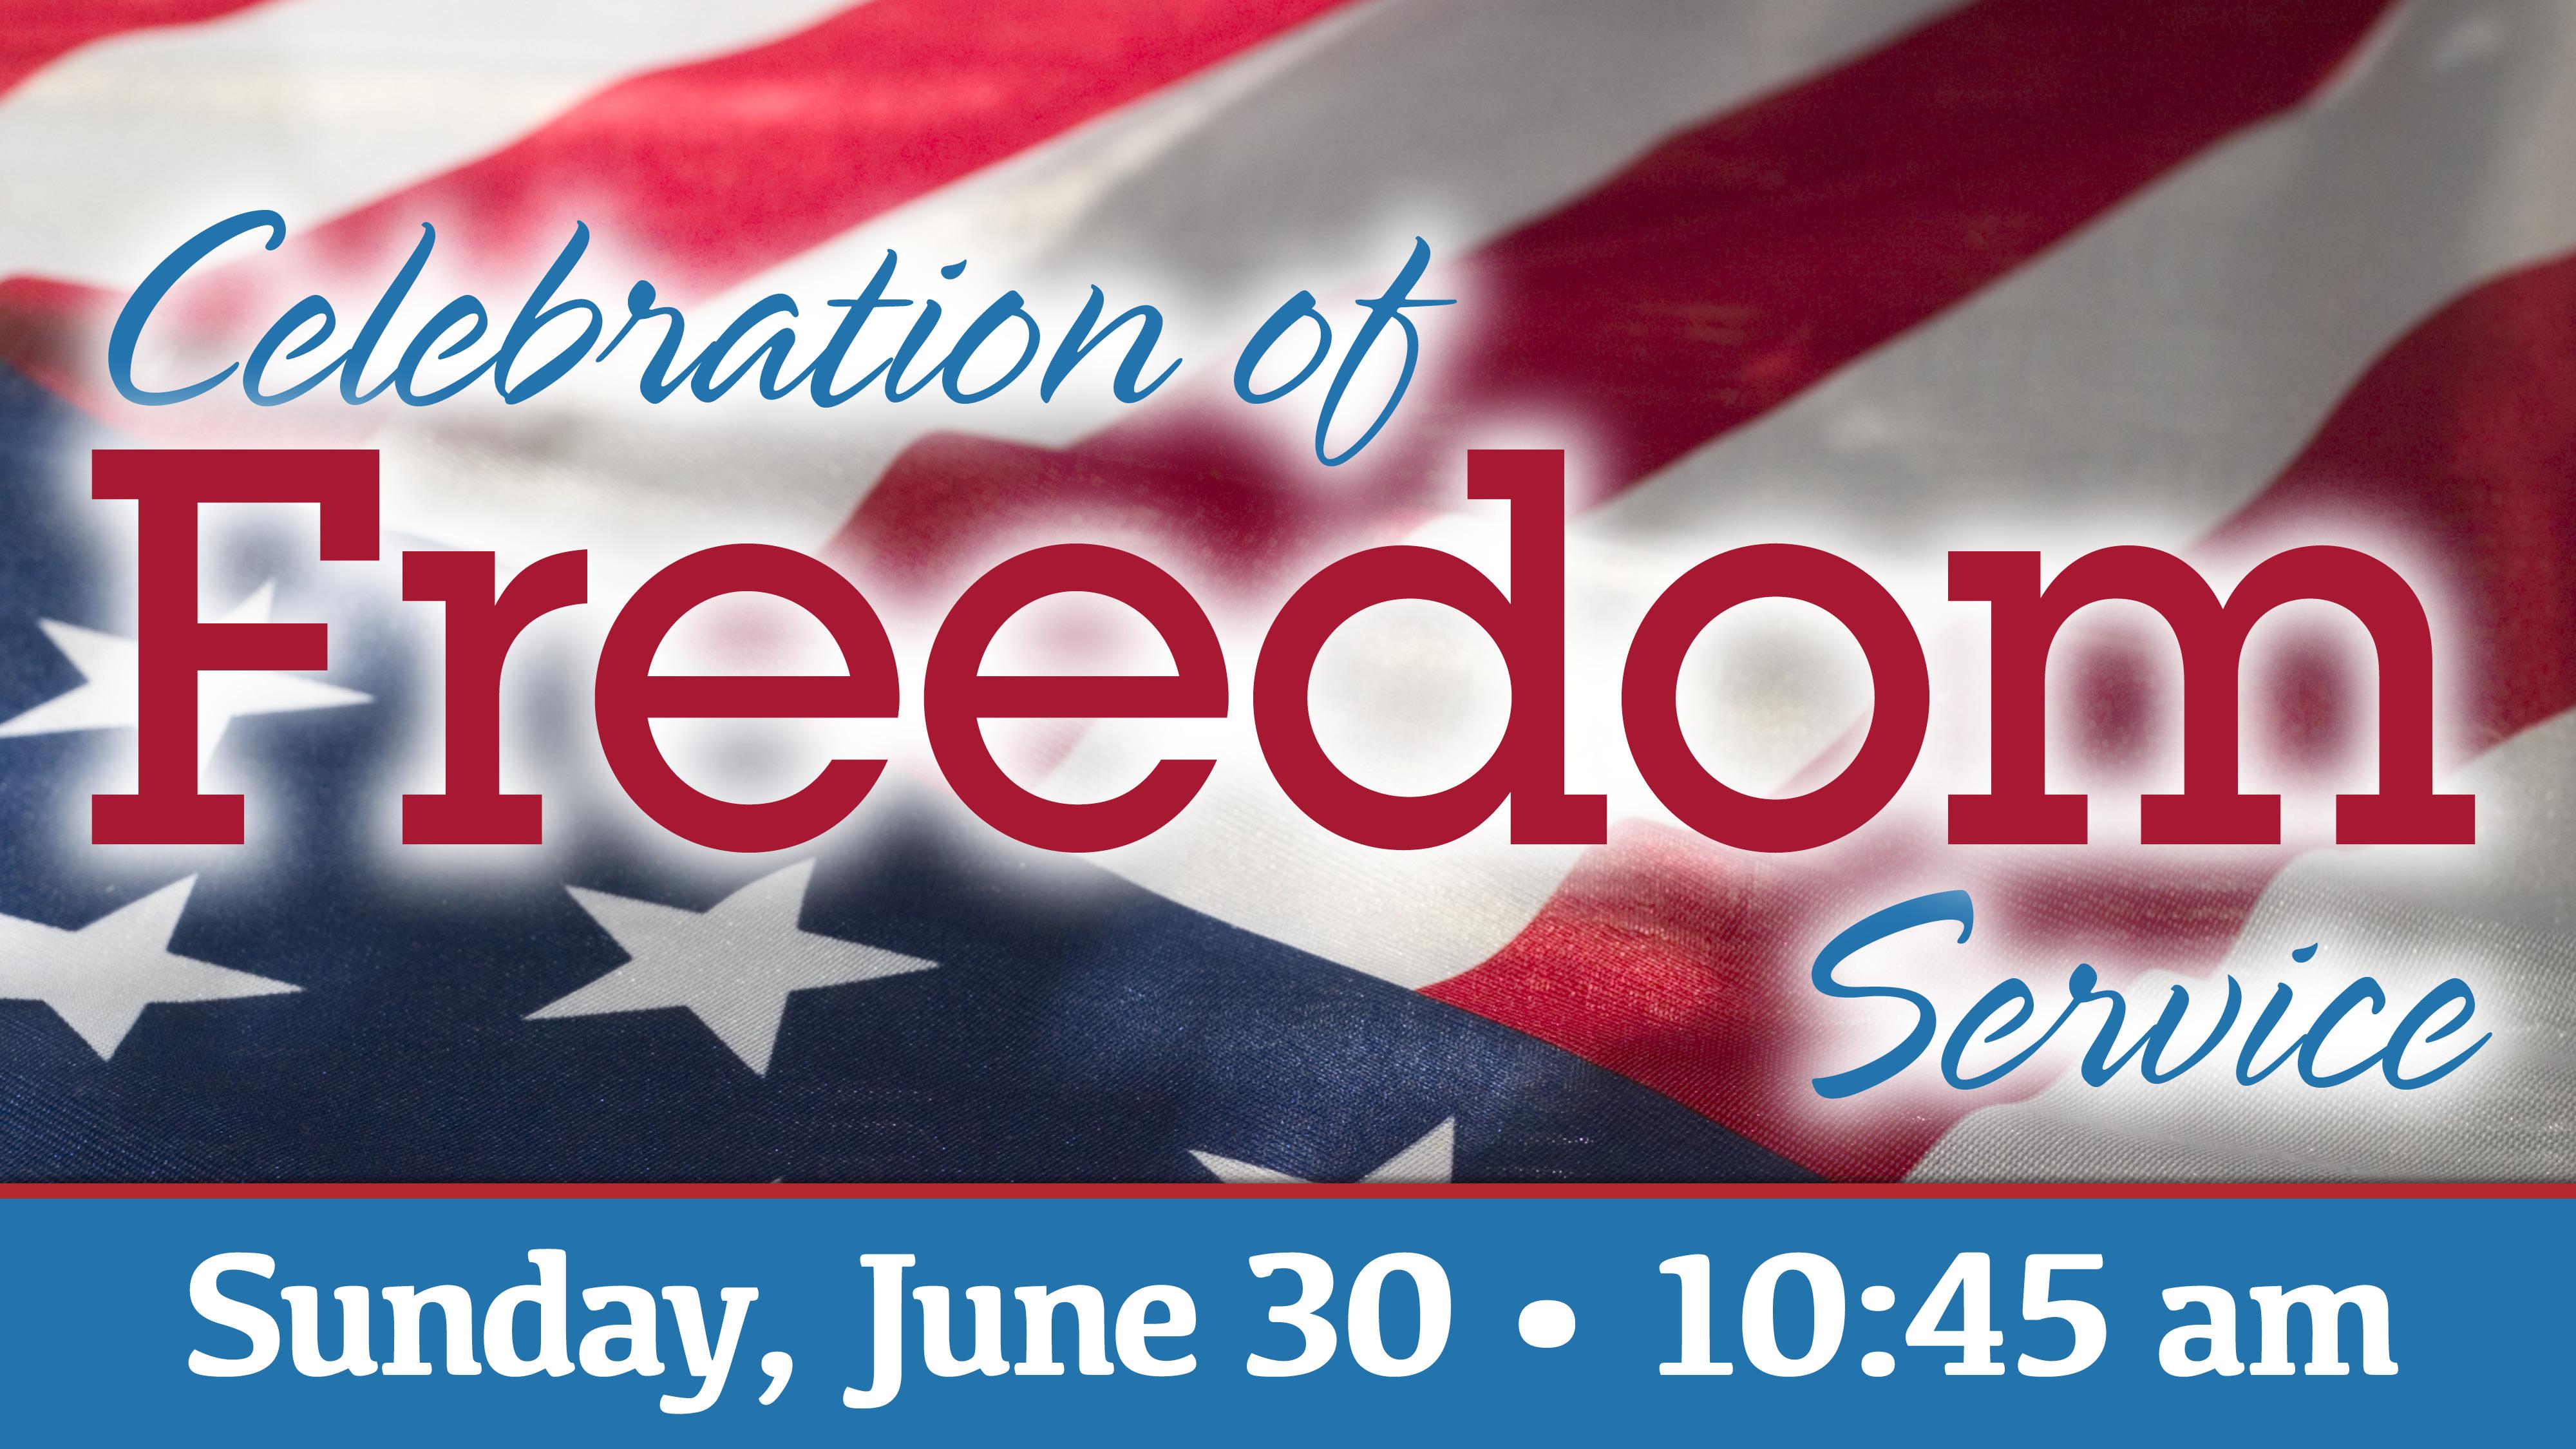 Celebration of Freedom Service